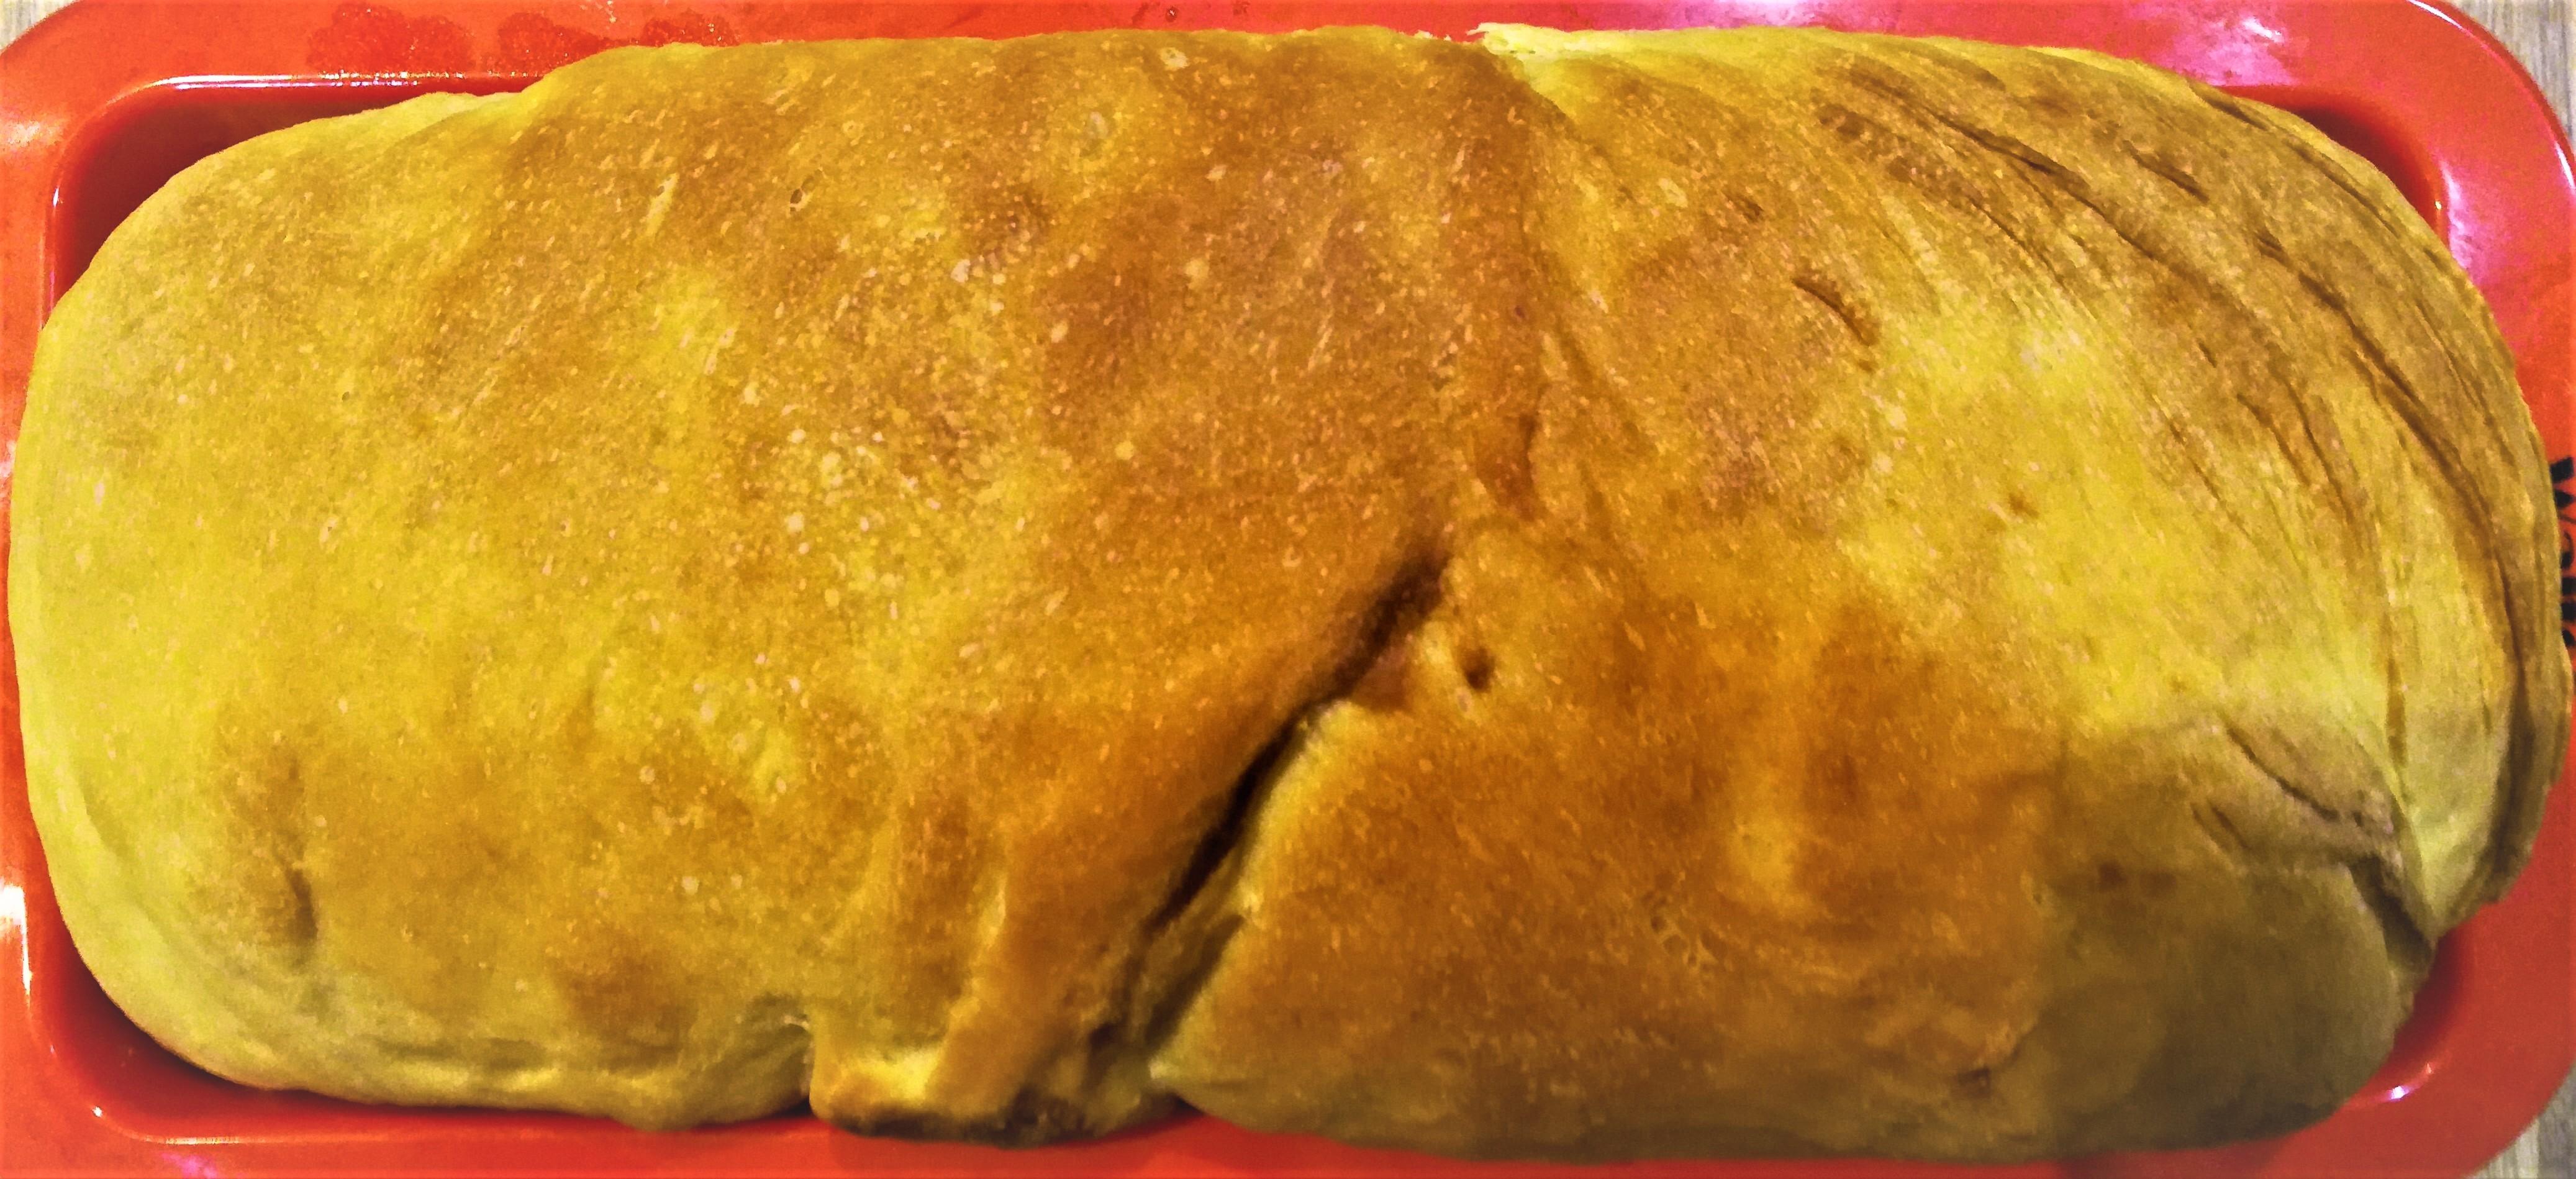 Best Italian Ciabatta Bread Recipe или лучший рецепт итальятского хлеба чиабатта